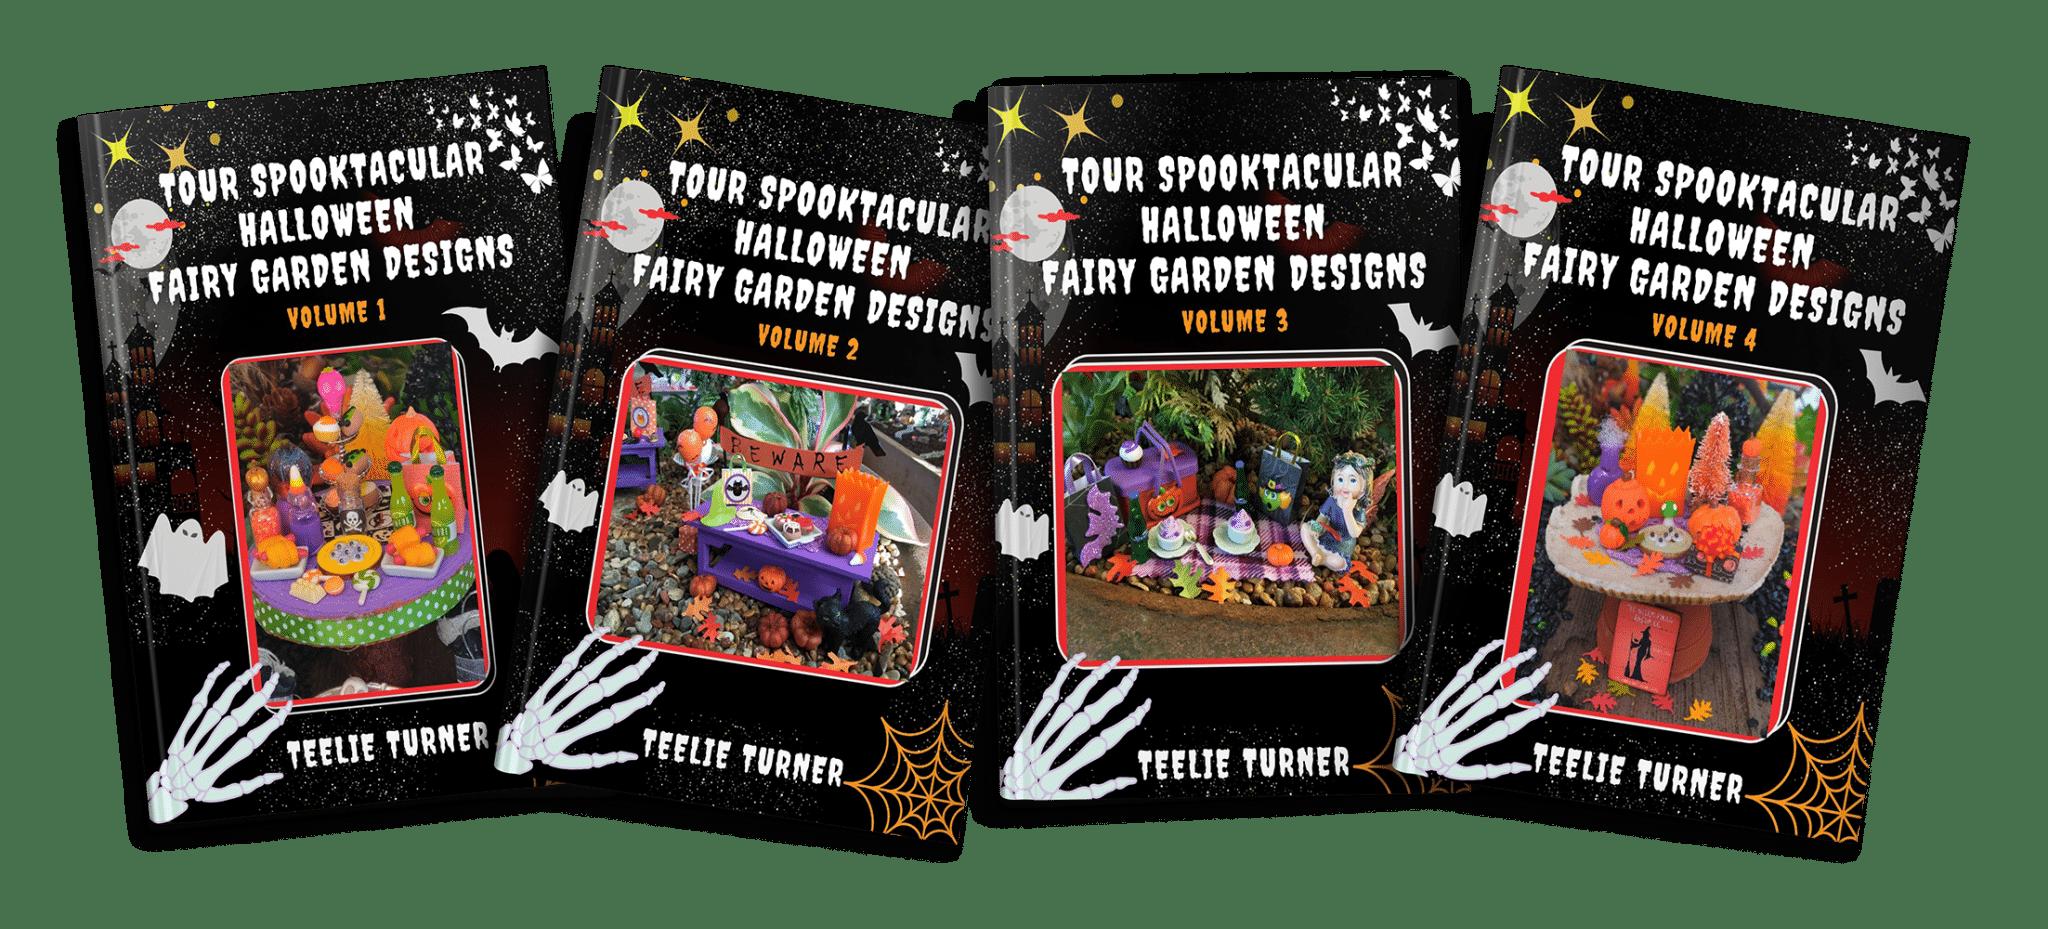 tour spooktacular 4books